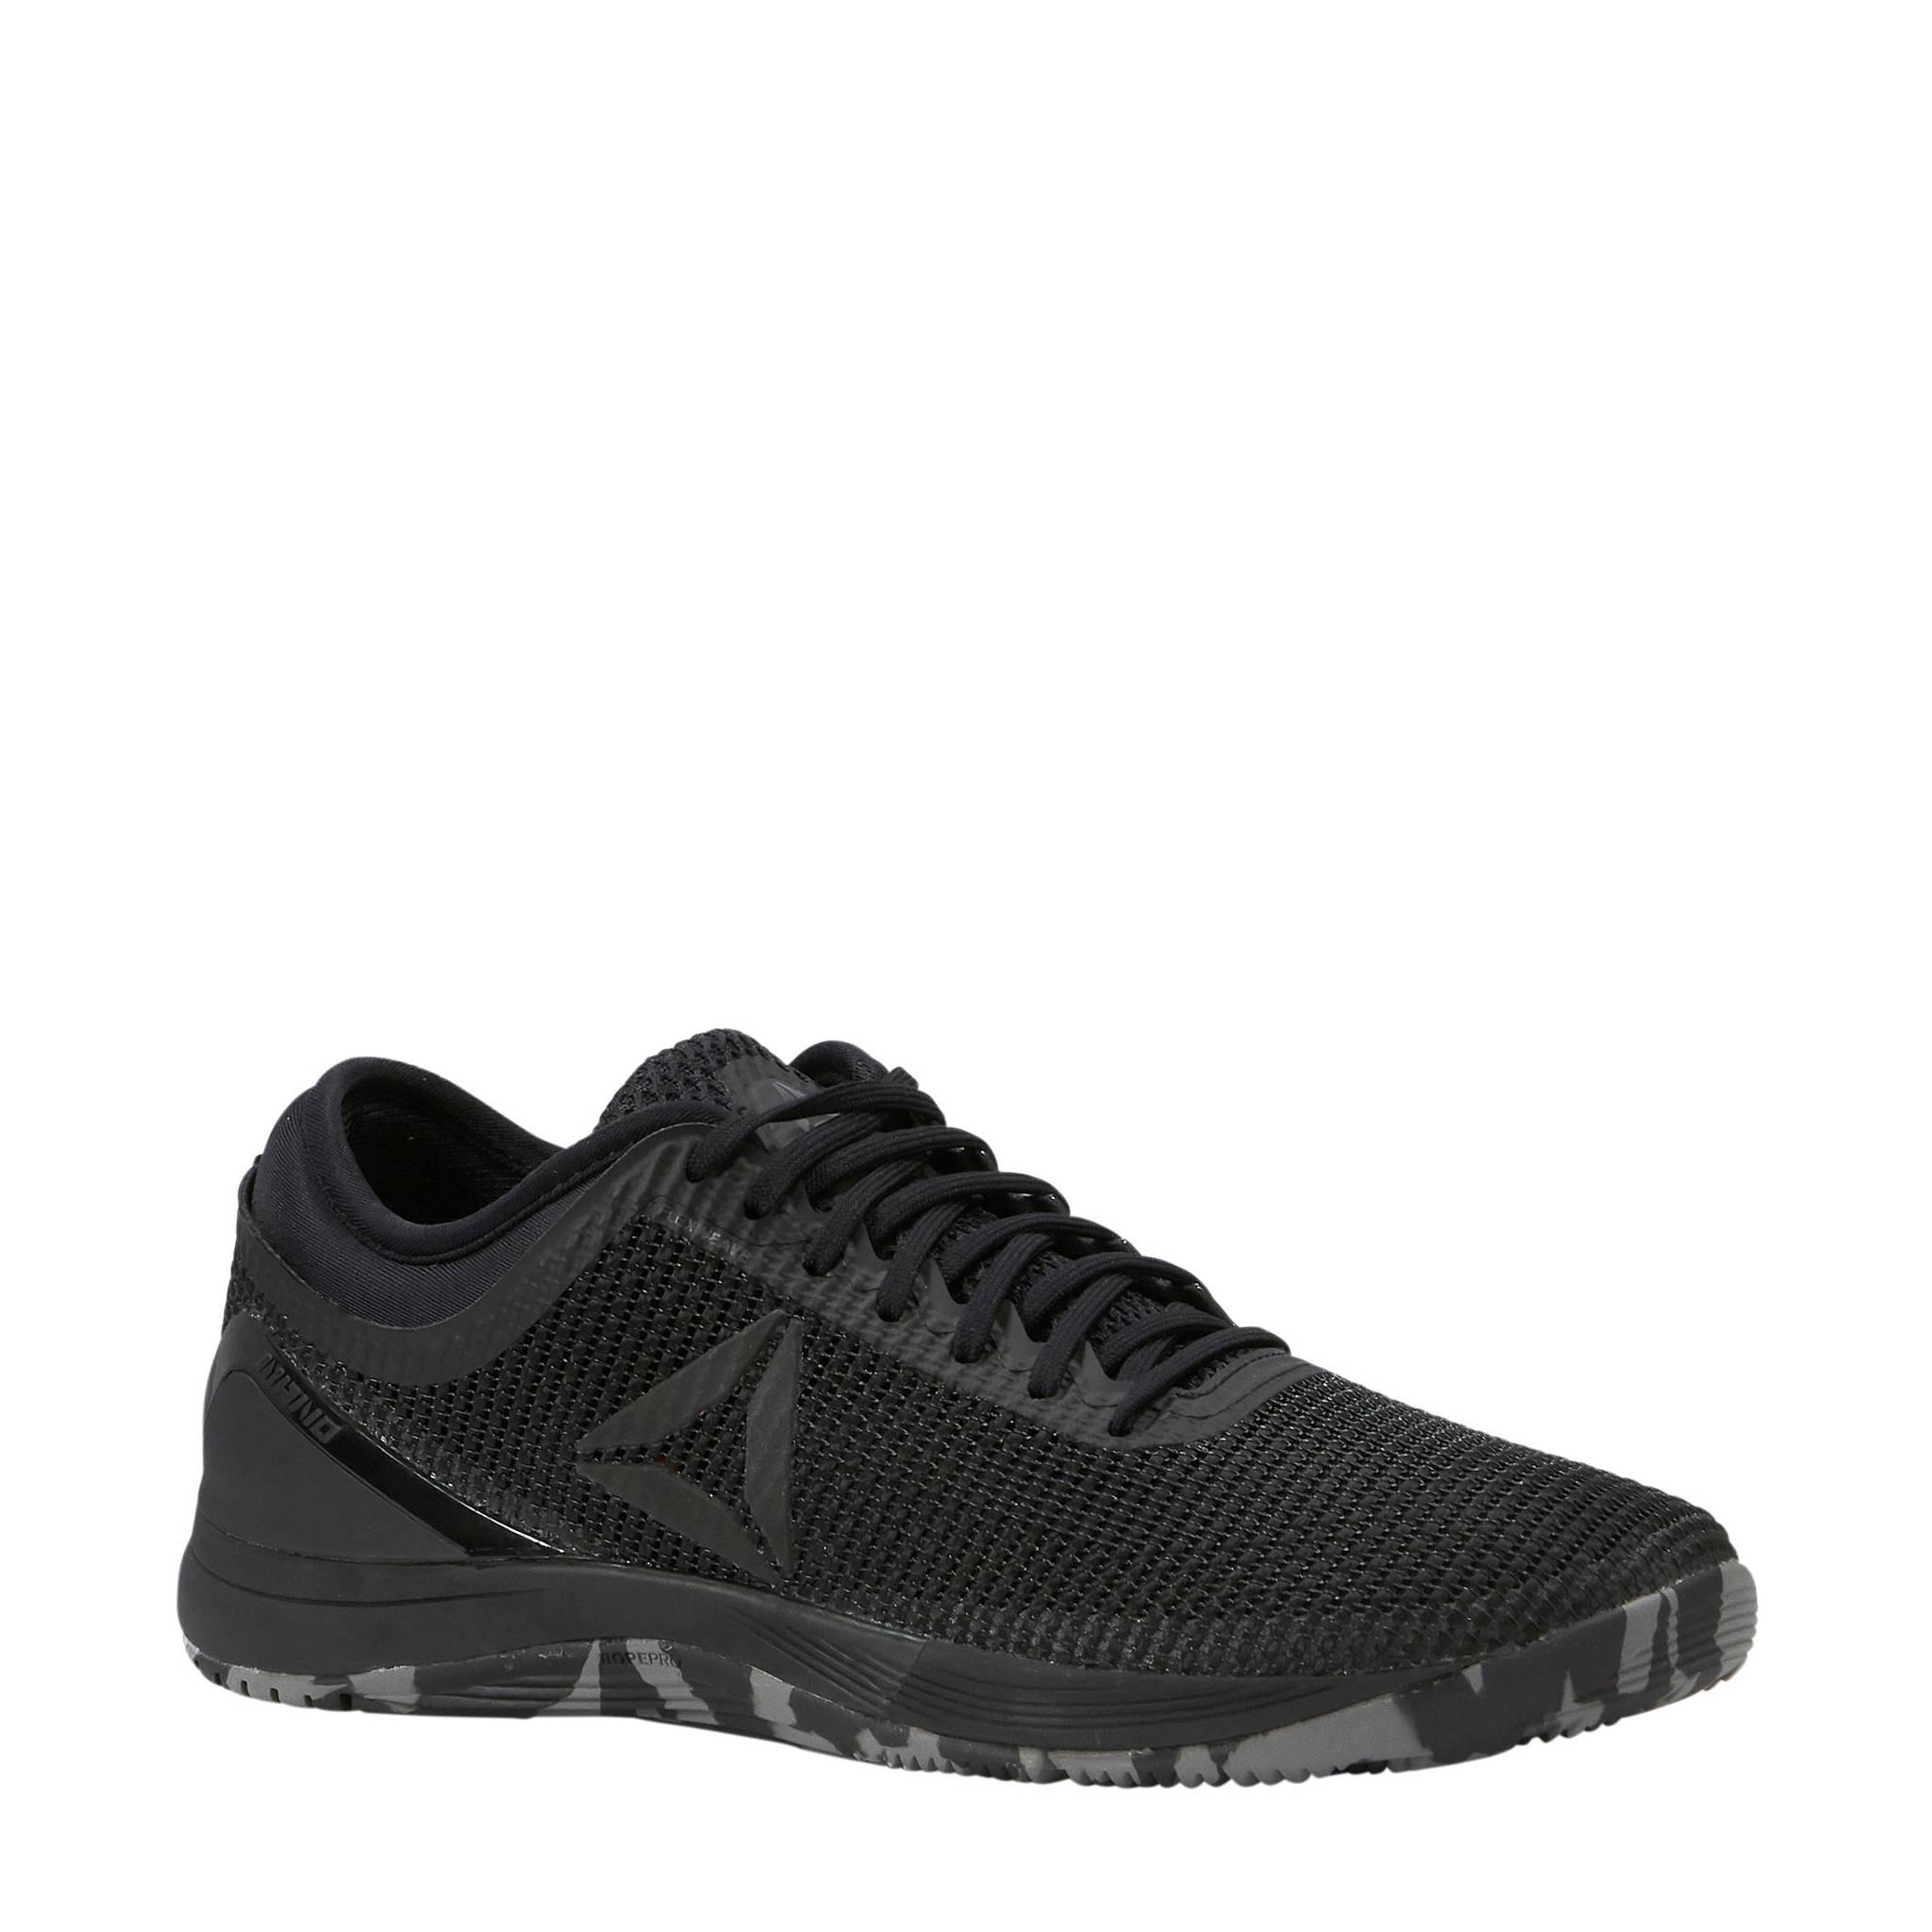 4b11974cd9a Reebok Fitness R CrossFit Nano 8.0 fitness schoenen zwart | wehkamp